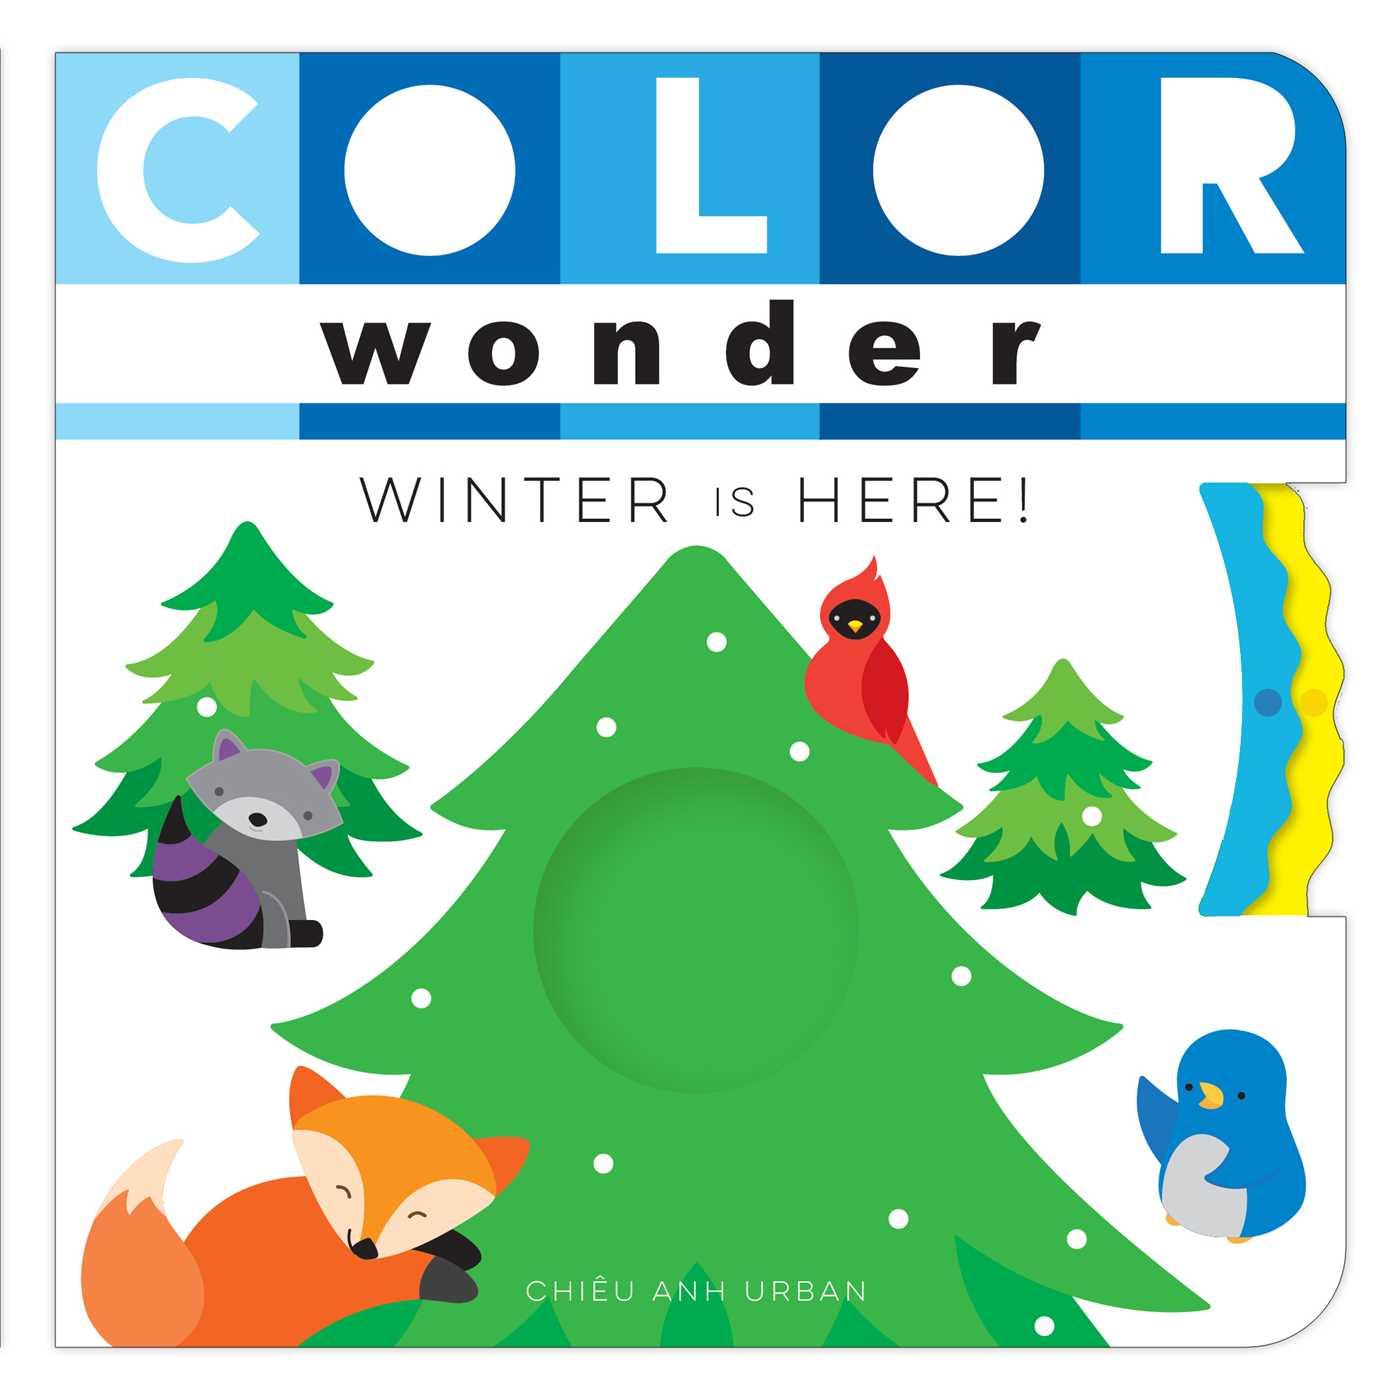 Color wonder winter is here 9781481487214 hr